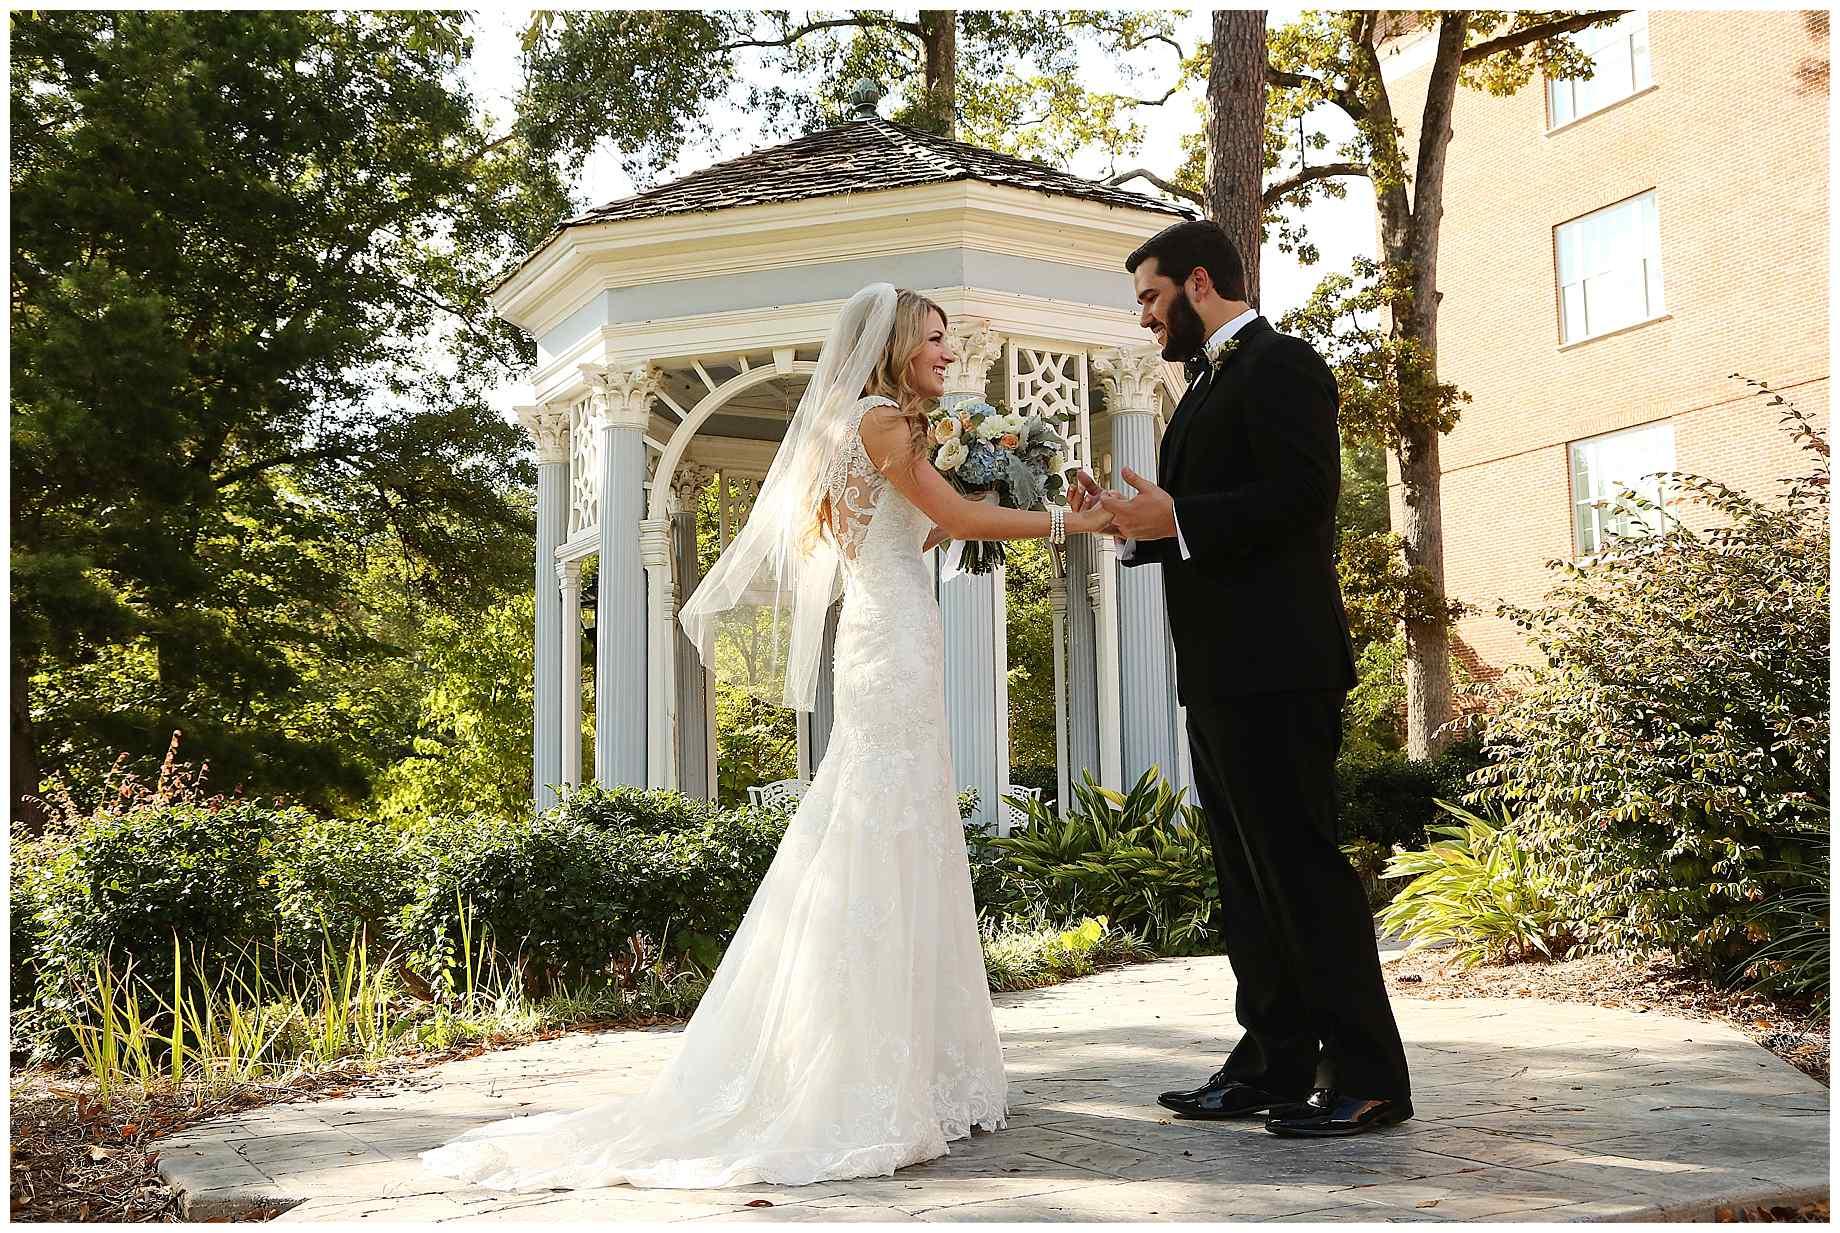 centenary-college-wedding-photos-shreveport-004